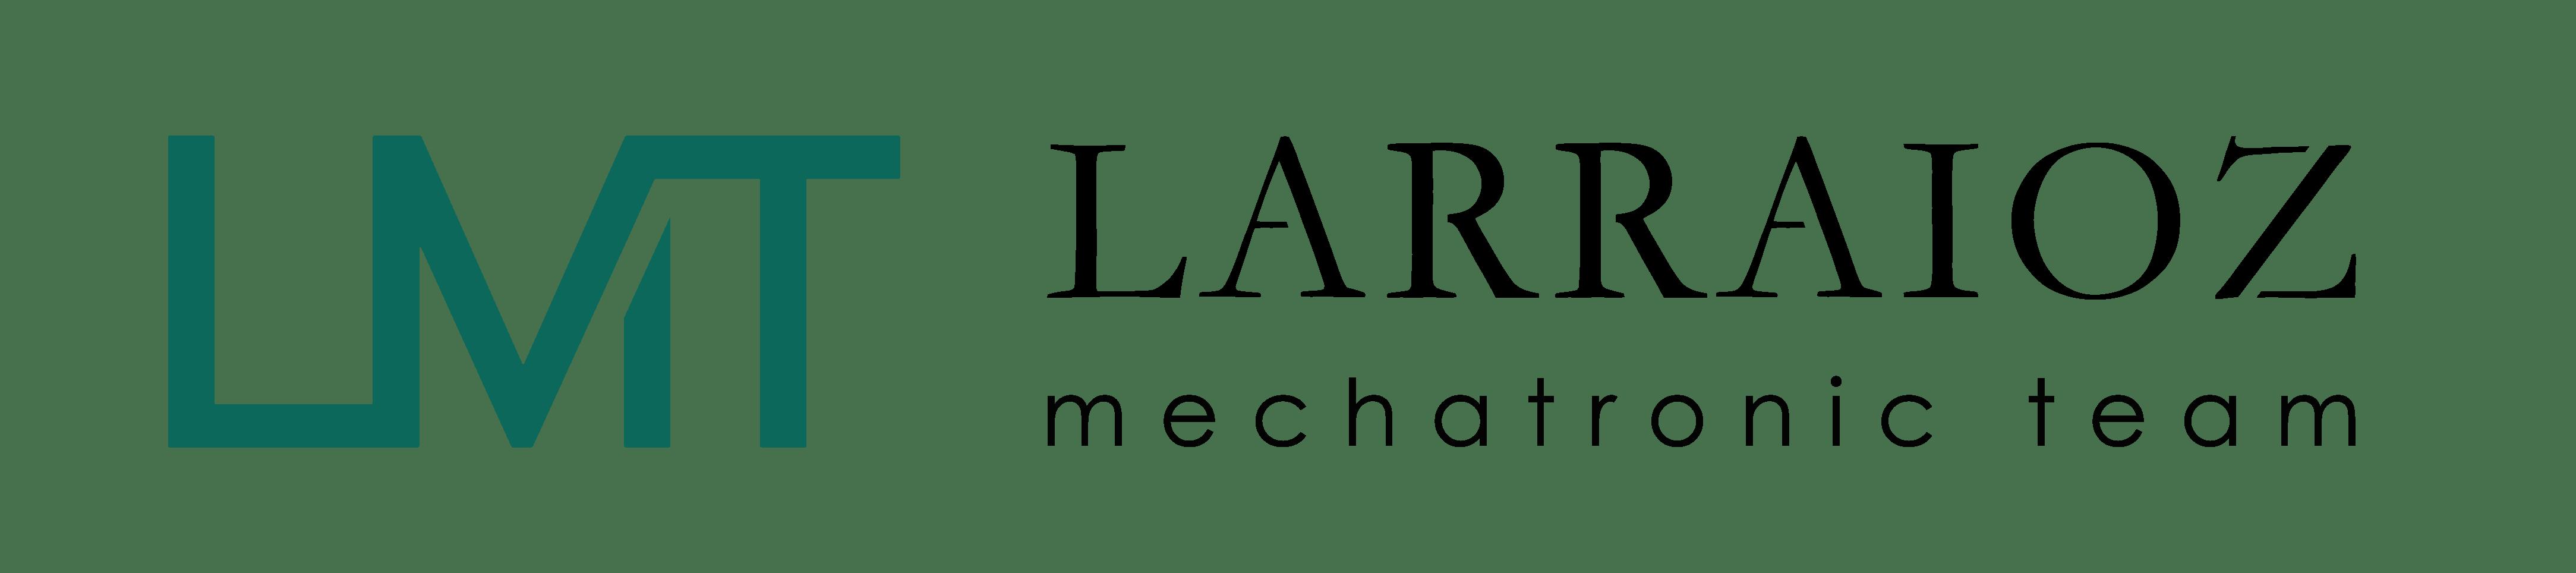 larraioz mechatronic team